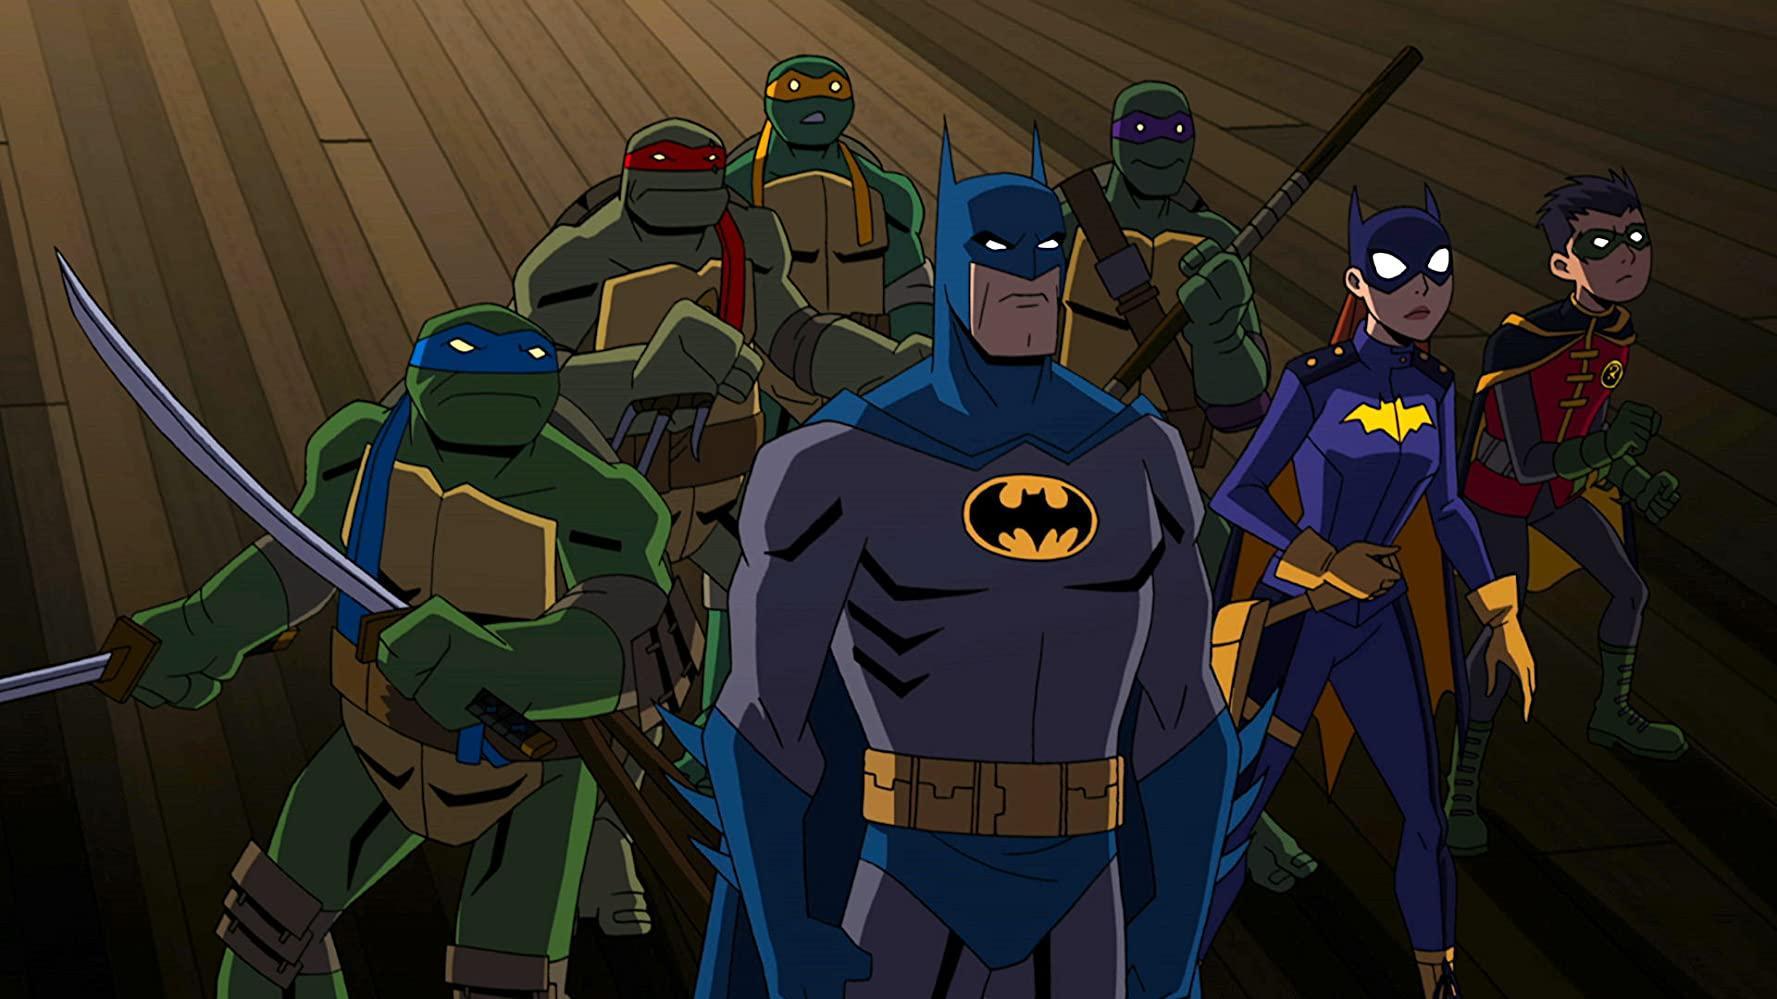 مشاهدة فيلم Batman vs. Teenage Mutant Ninja Turtles (2019) مترجم HD اون لاين